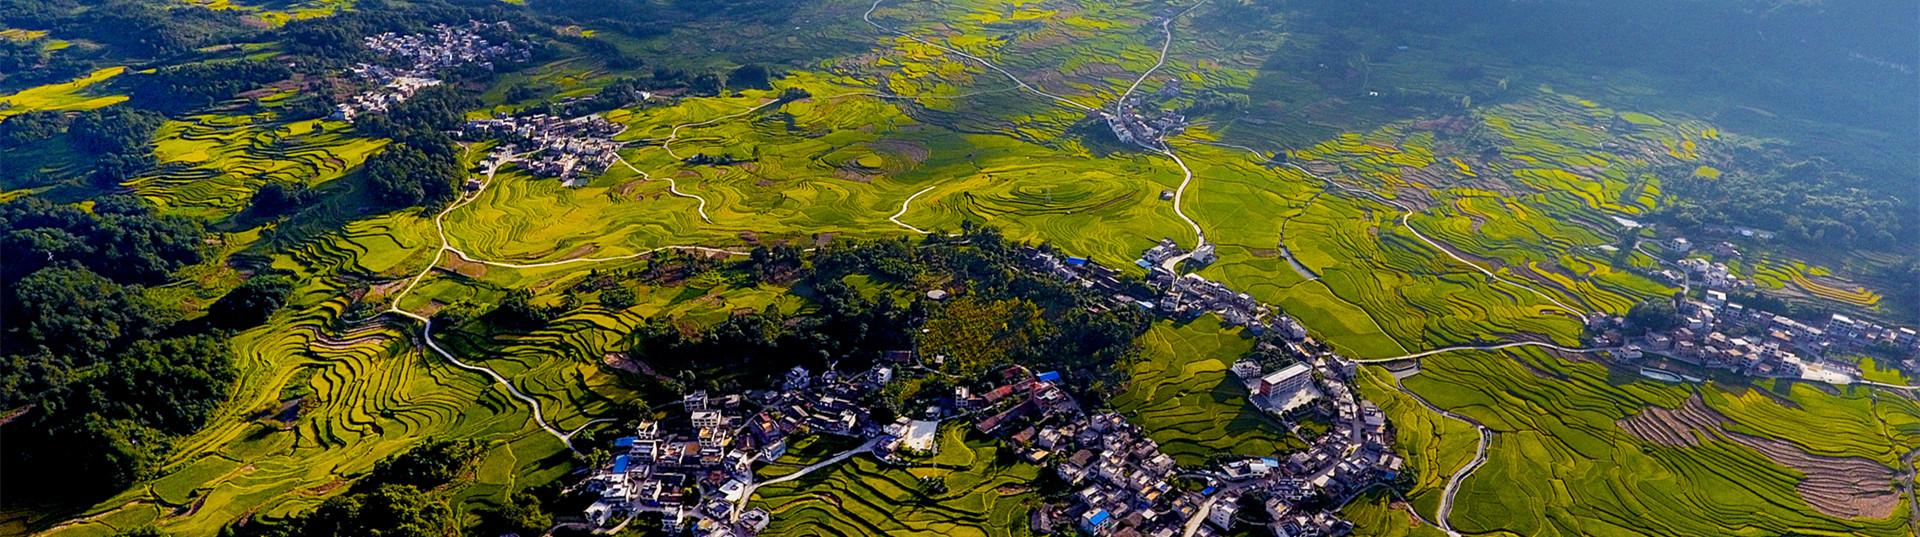 Hechi's population passes 34 million